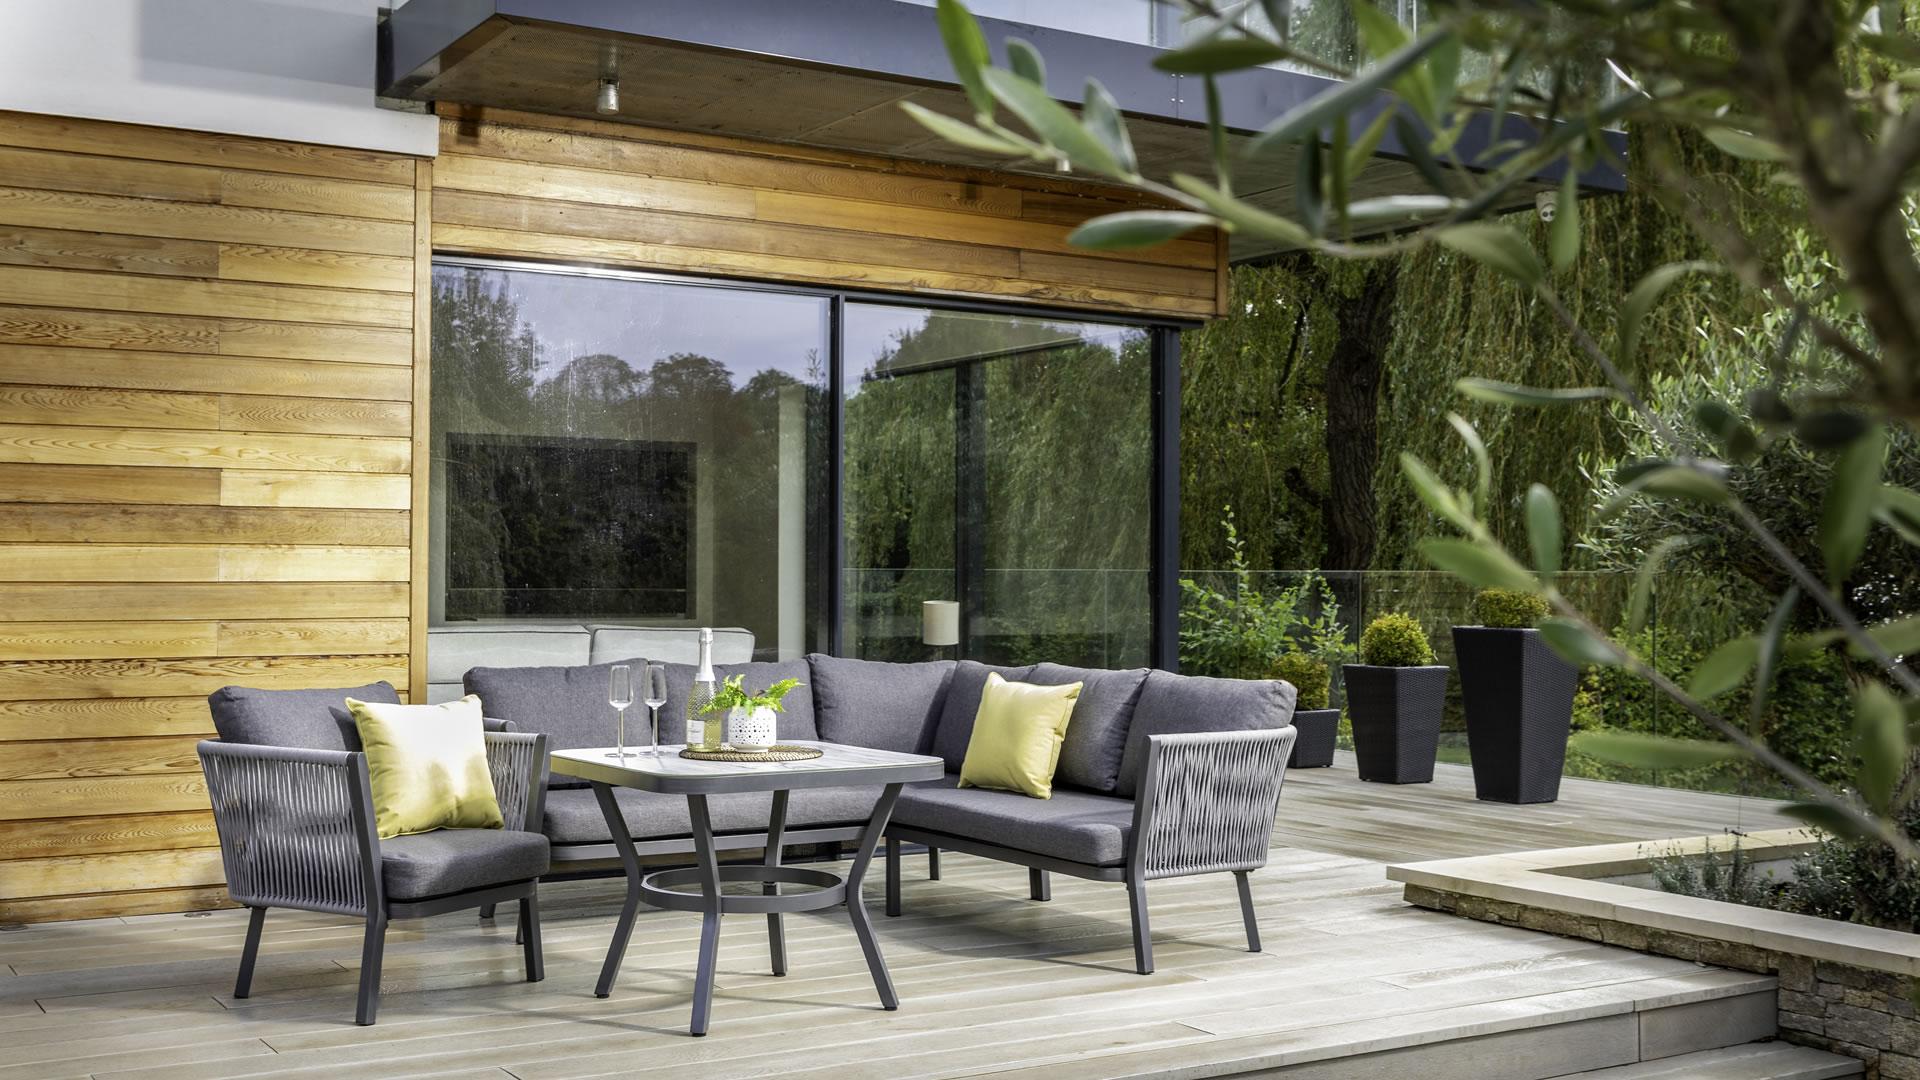 Home - Hartman Outdoor Furniture Products UK